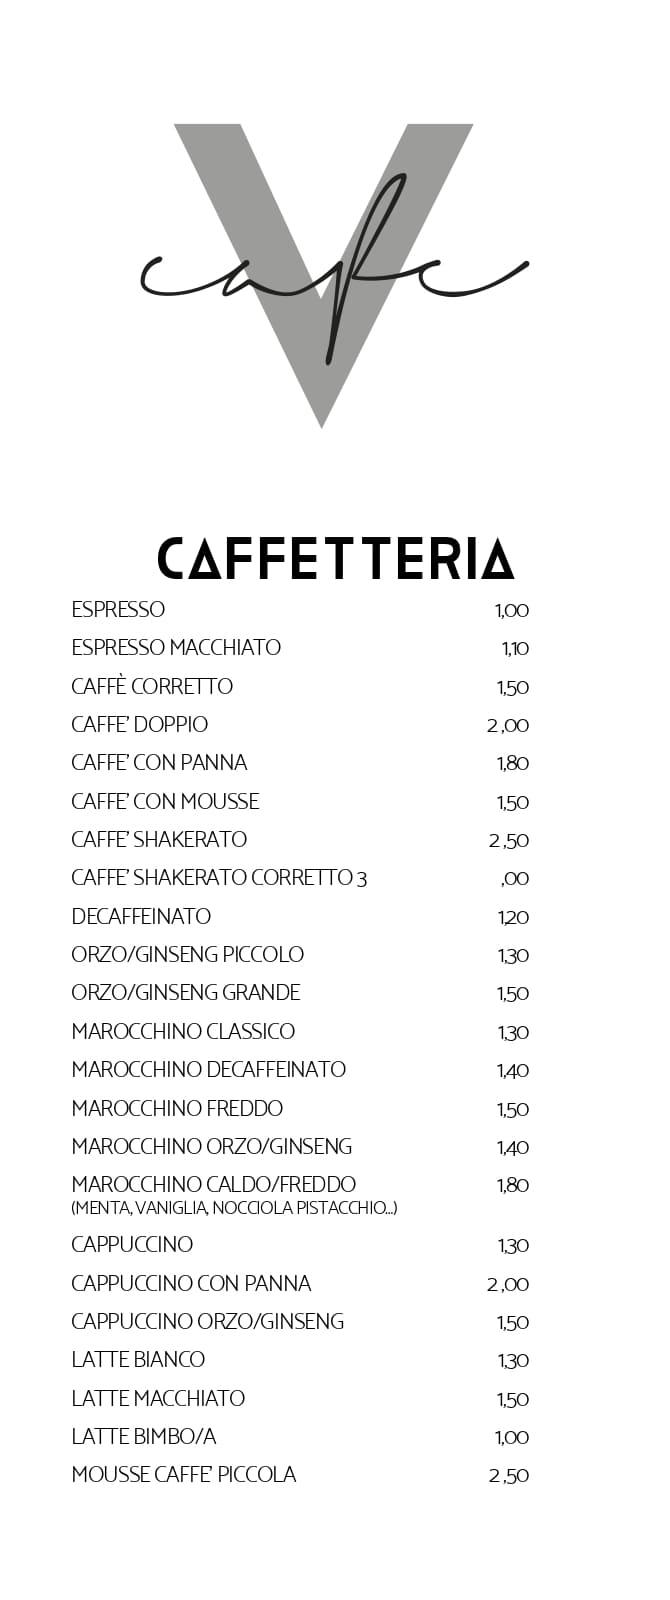 Vanity MENU CAFFETTERIA page 1